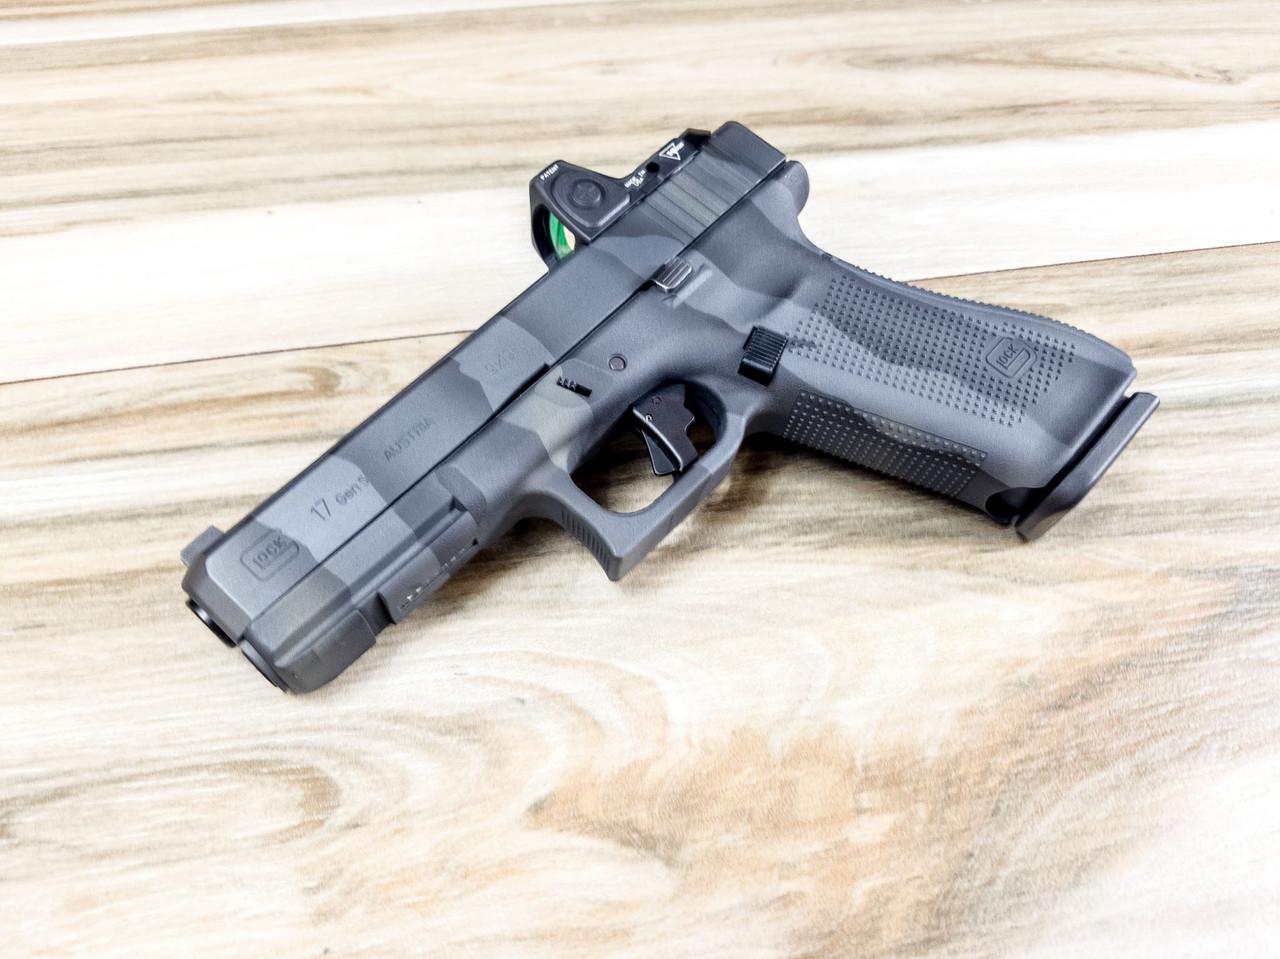 Glock 17 Gen 5 9mm, Cerakote Urban Tiger stripe